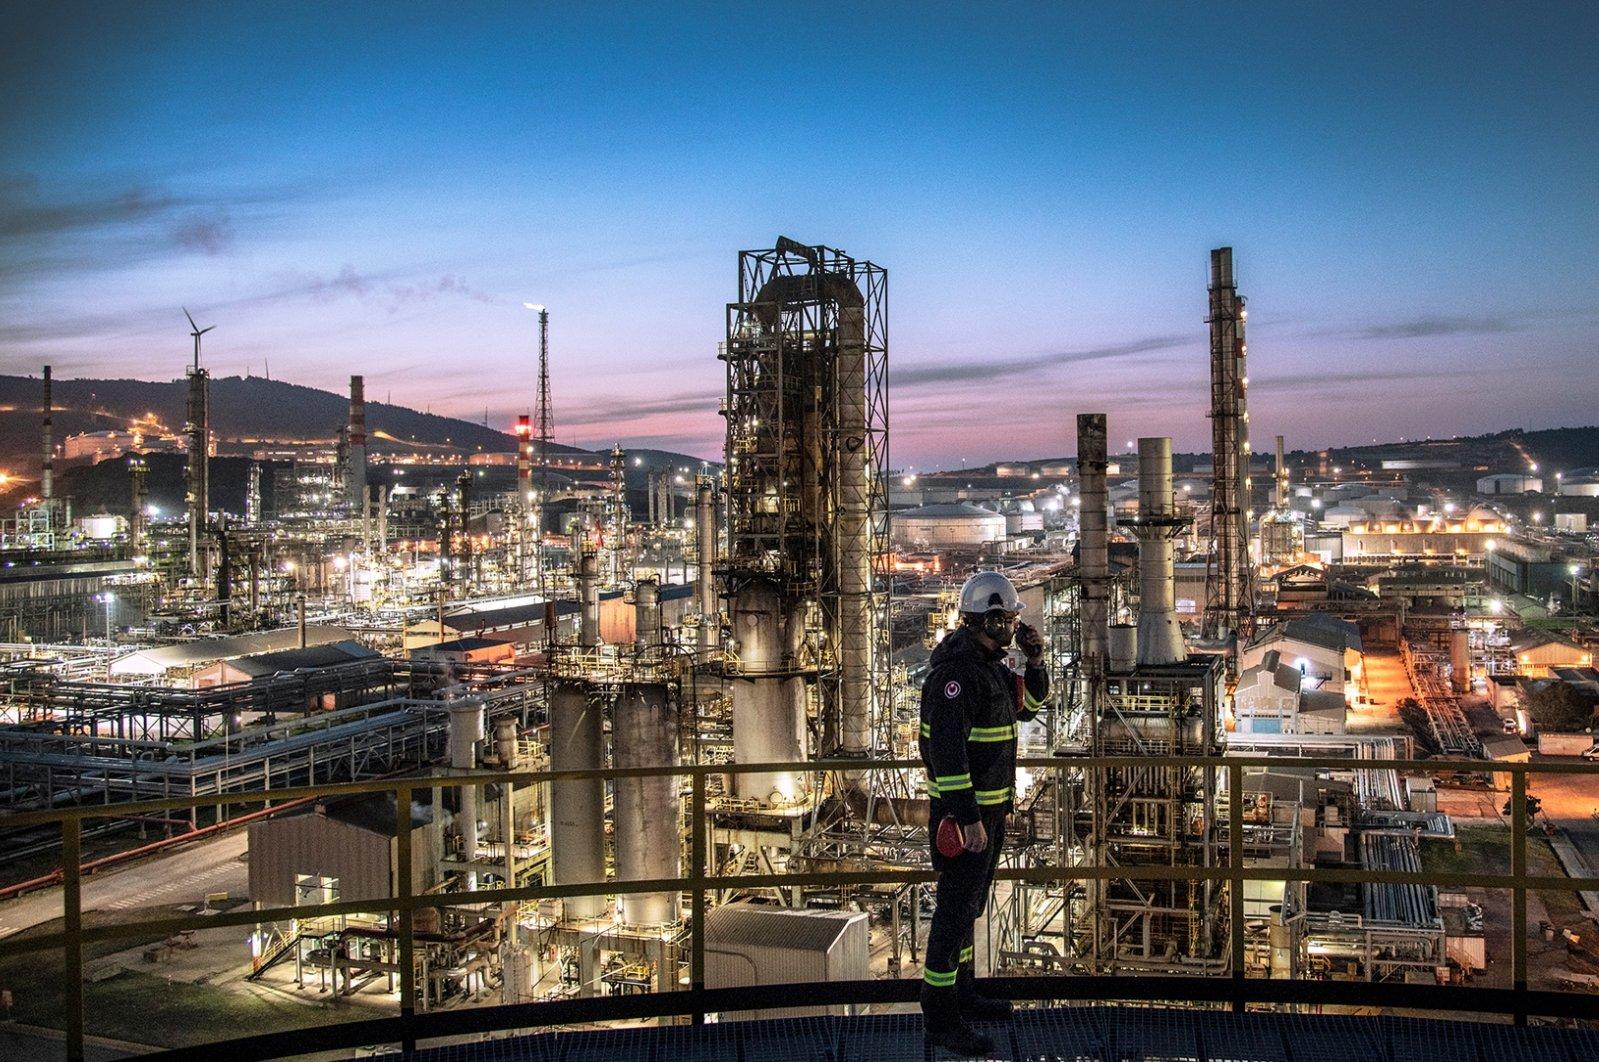 A worker is seen at Tüpraş's oil refinery in western Turkey's Izmir, May 15, 2018. (Photo courtesy of Tüpraş)